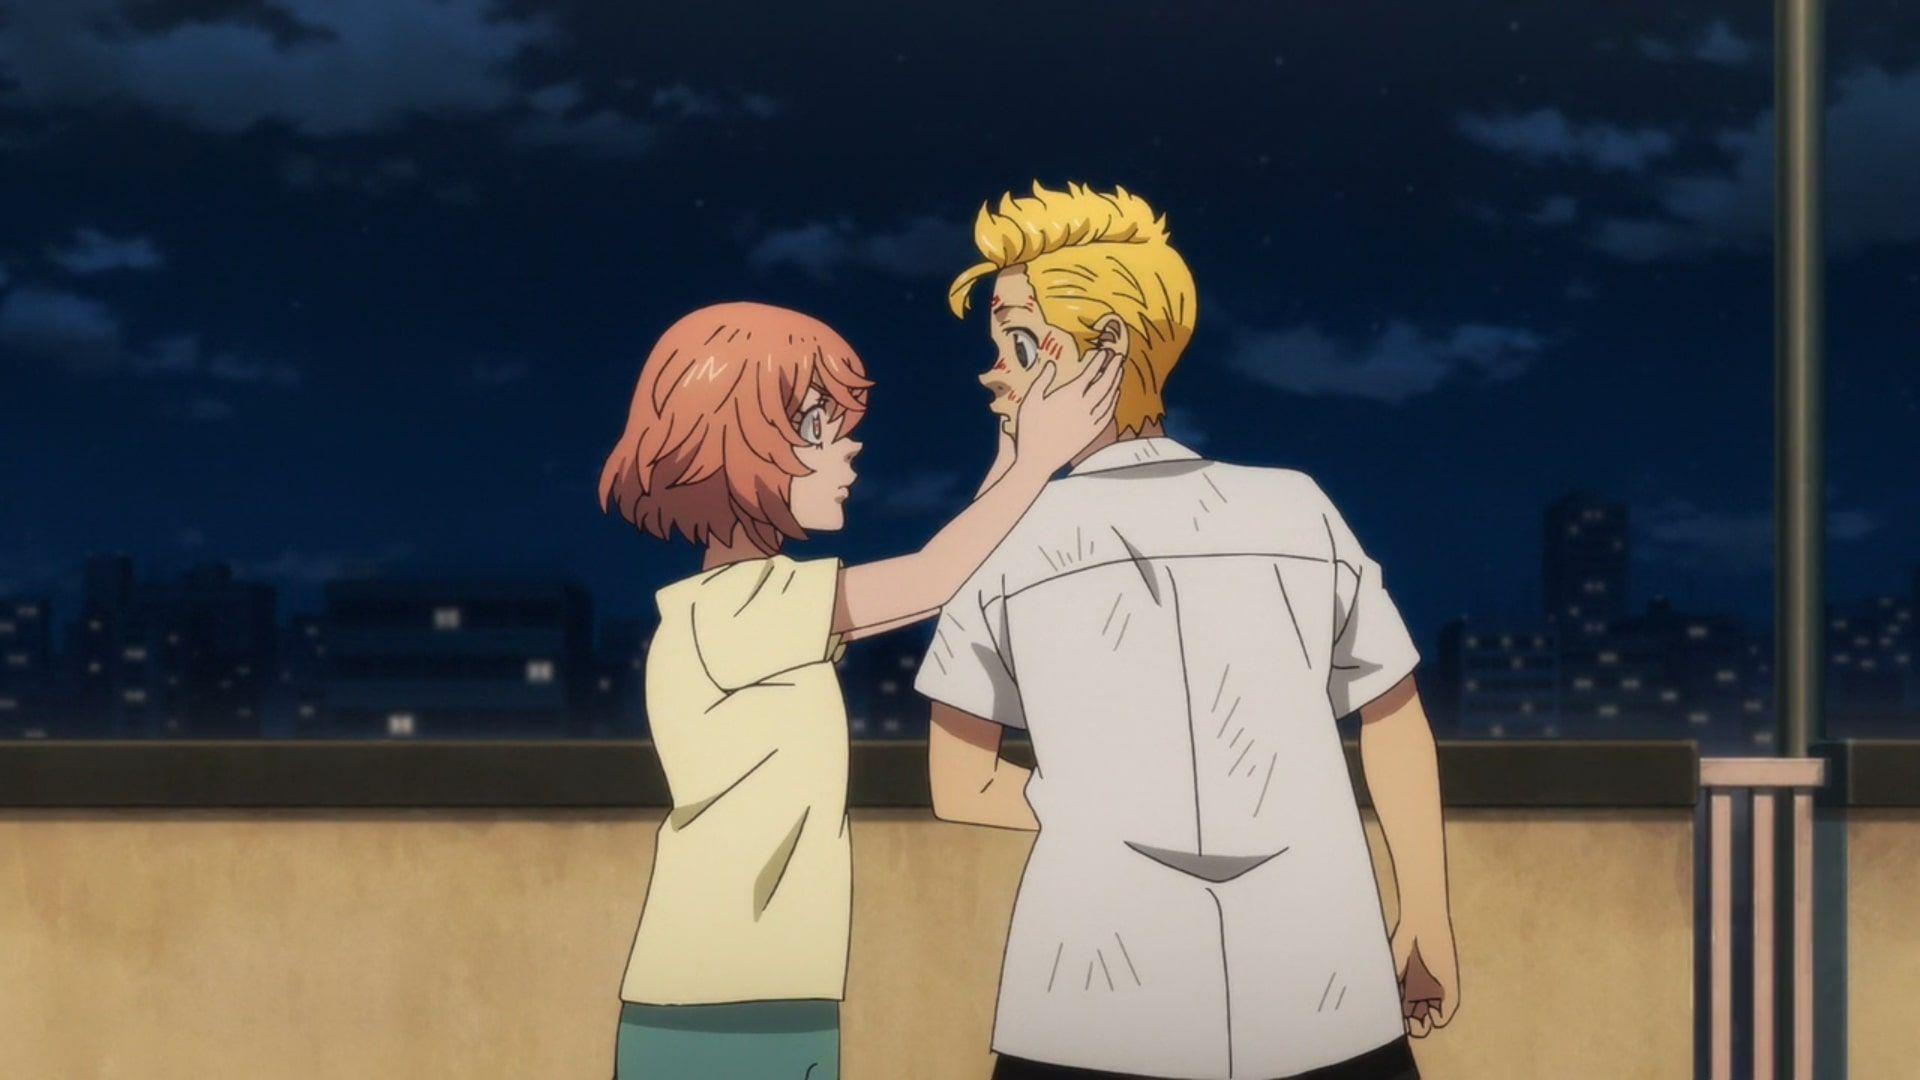 Who is Takemichi Hanagaki's Love Interest